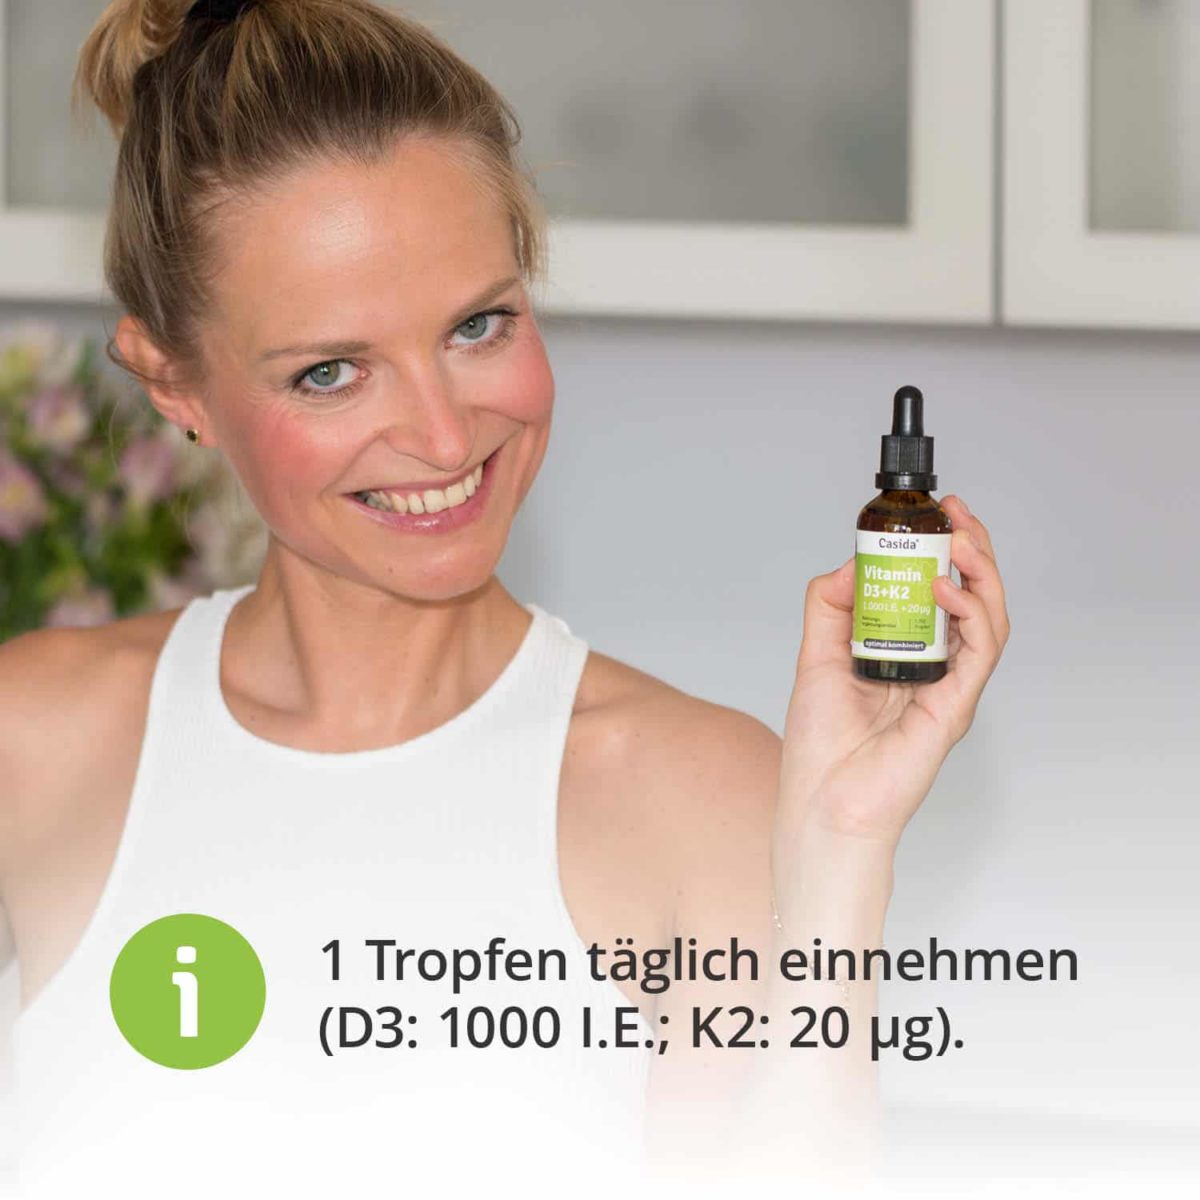 Casida Vitamin D3 1000 I.U. + K2 20 μg Drops – 50 ml 16672026 PZN Apotheke hochdosiert Immunsystem Magnesium Calcium6